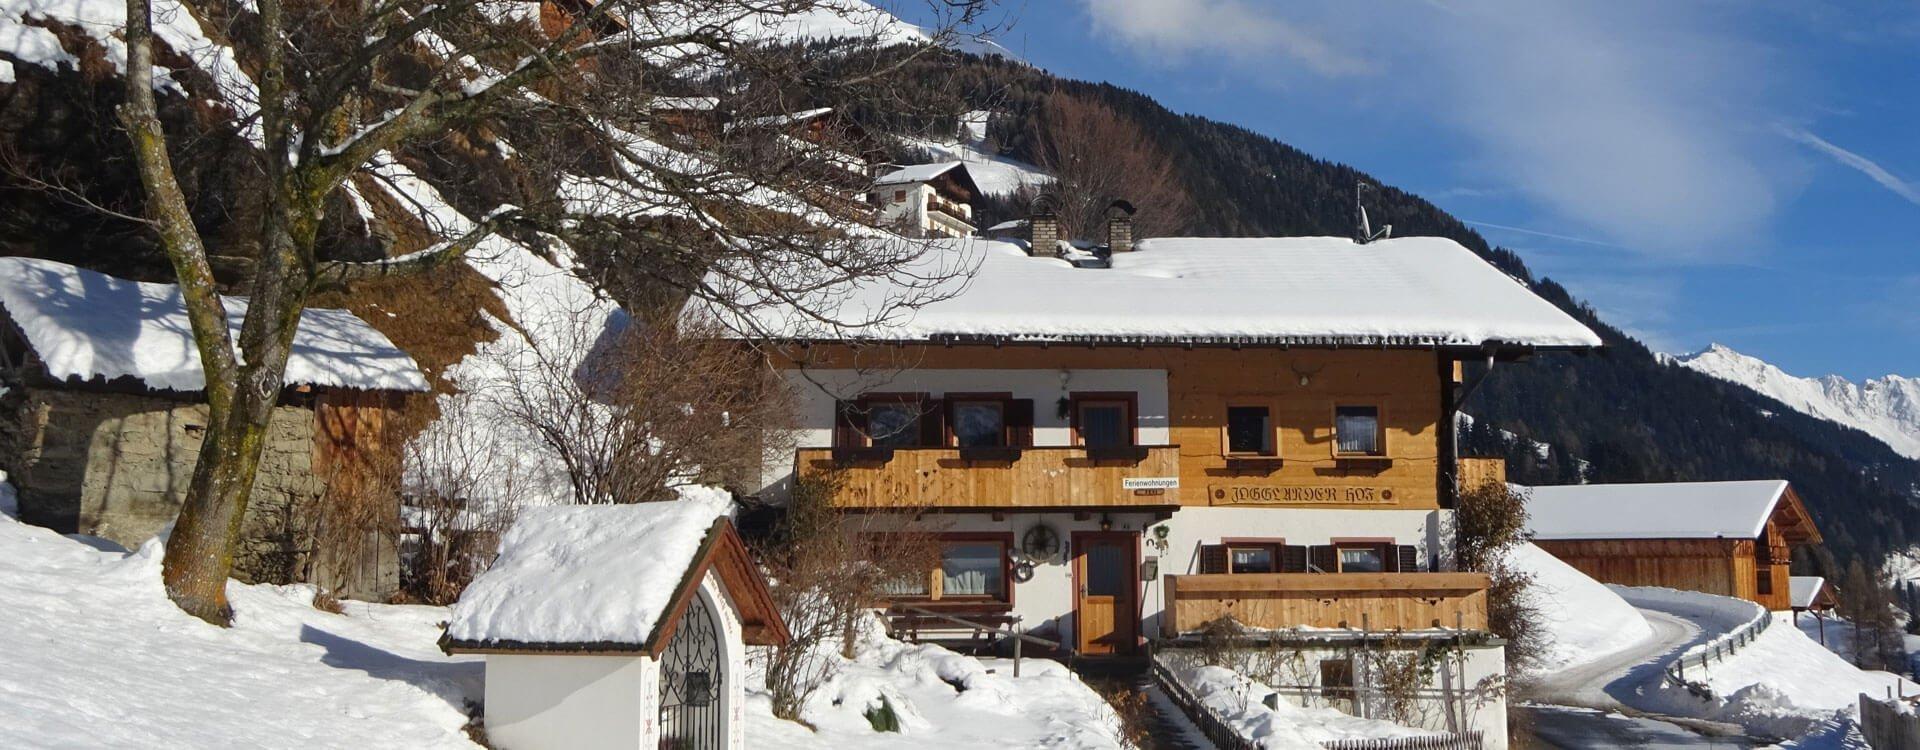 winterurlaub-passeiertal-suedtirol-1